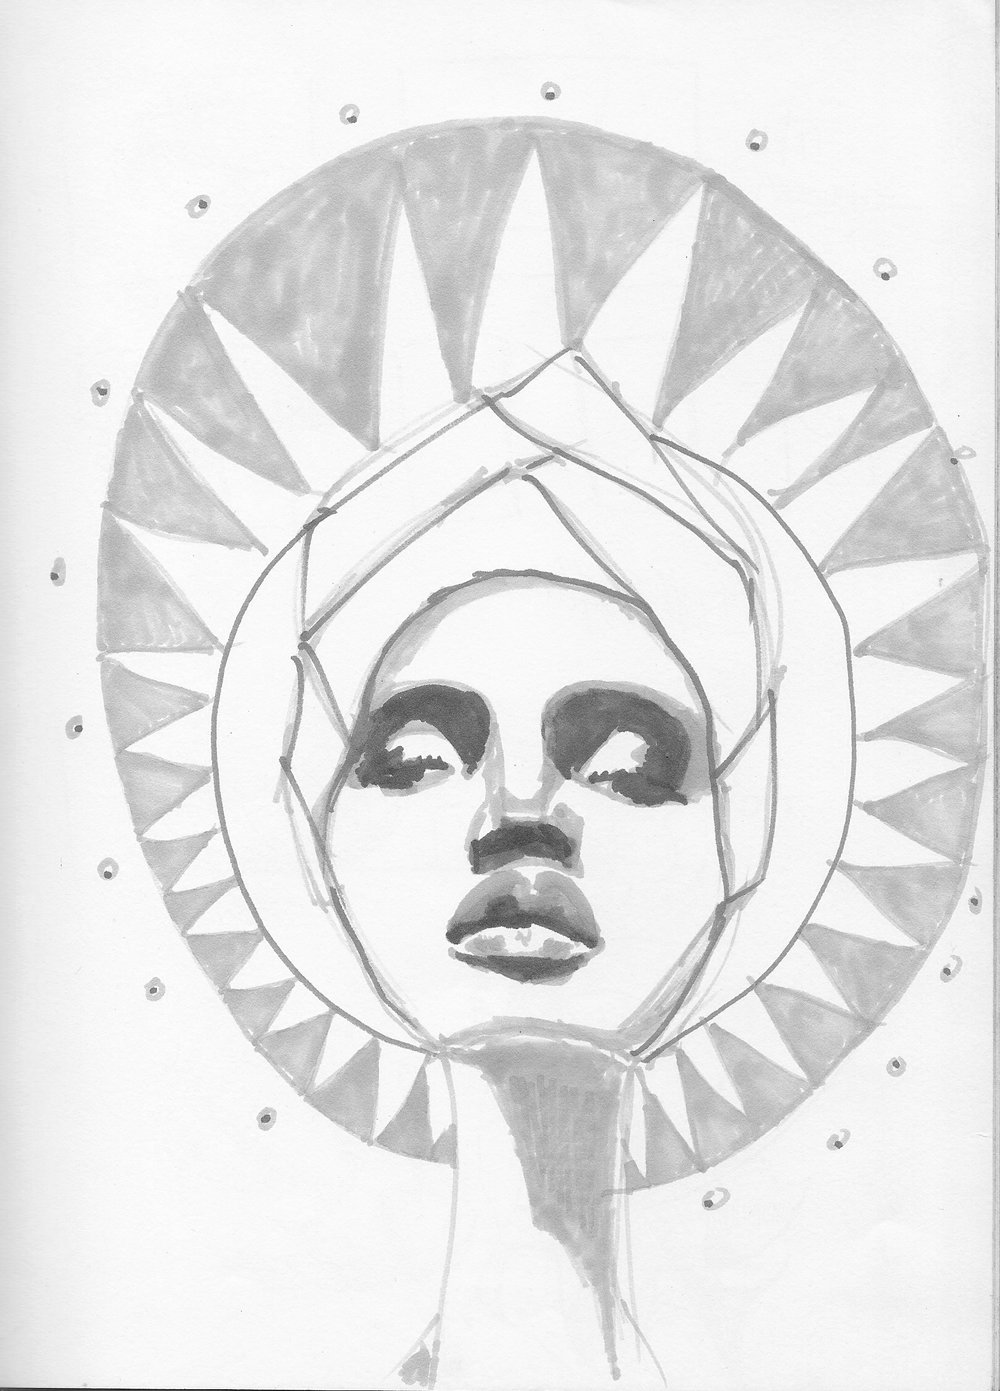 wynwood-artist-ivette-cabrera-sketches.jpg